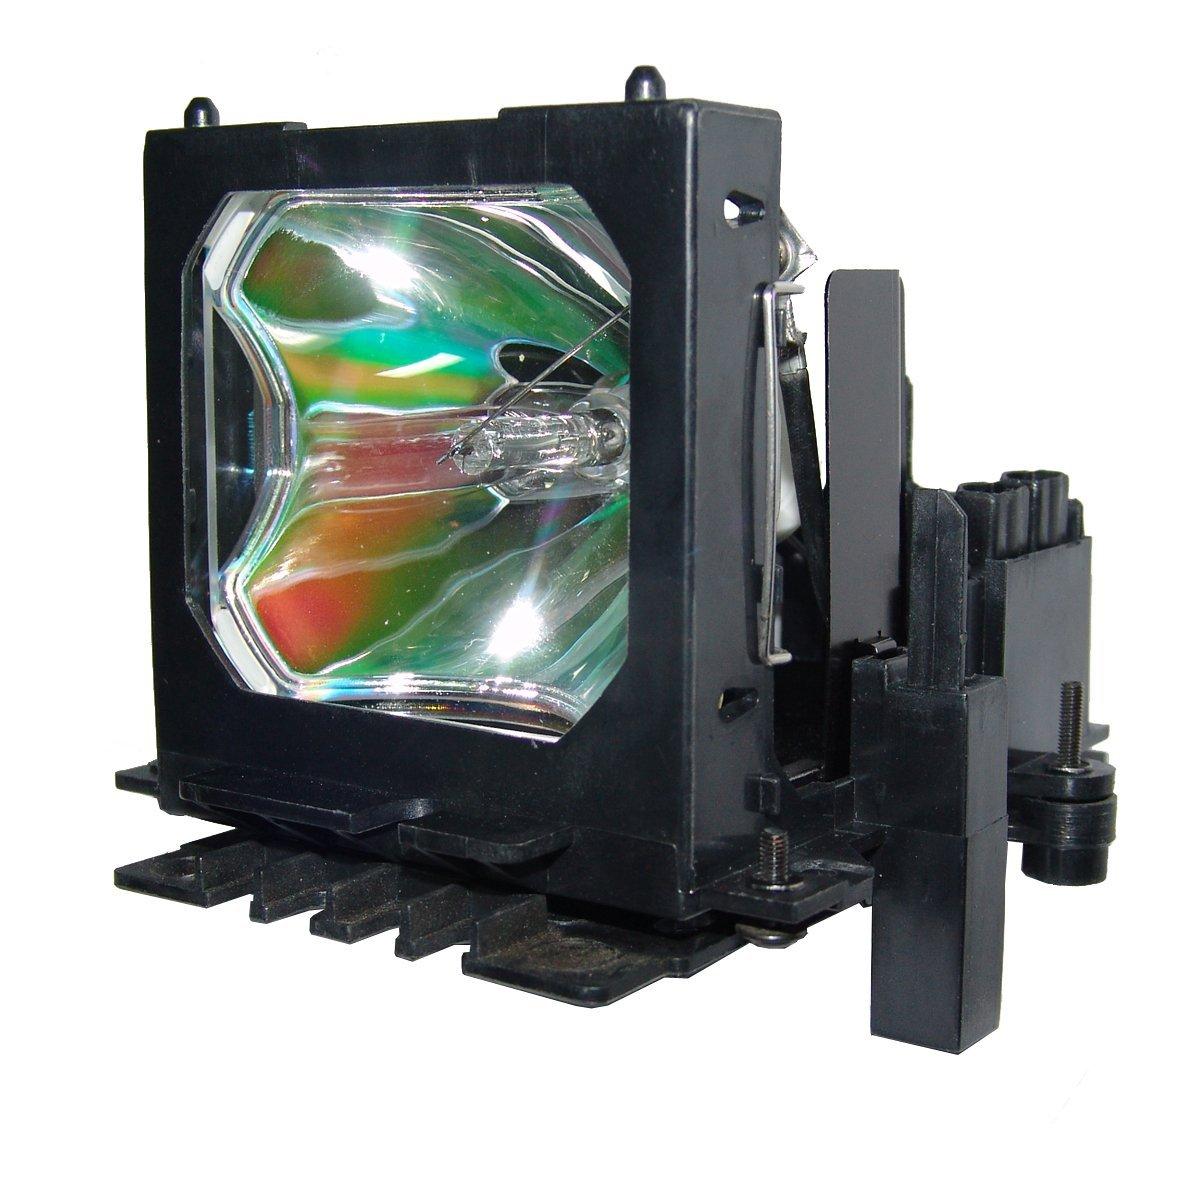 ФОТО Projector lamp bulb 65.J0H07.CG1 lamp for BENQ Projector PB9200 PE9200 bulb lamp with housing  free shipping